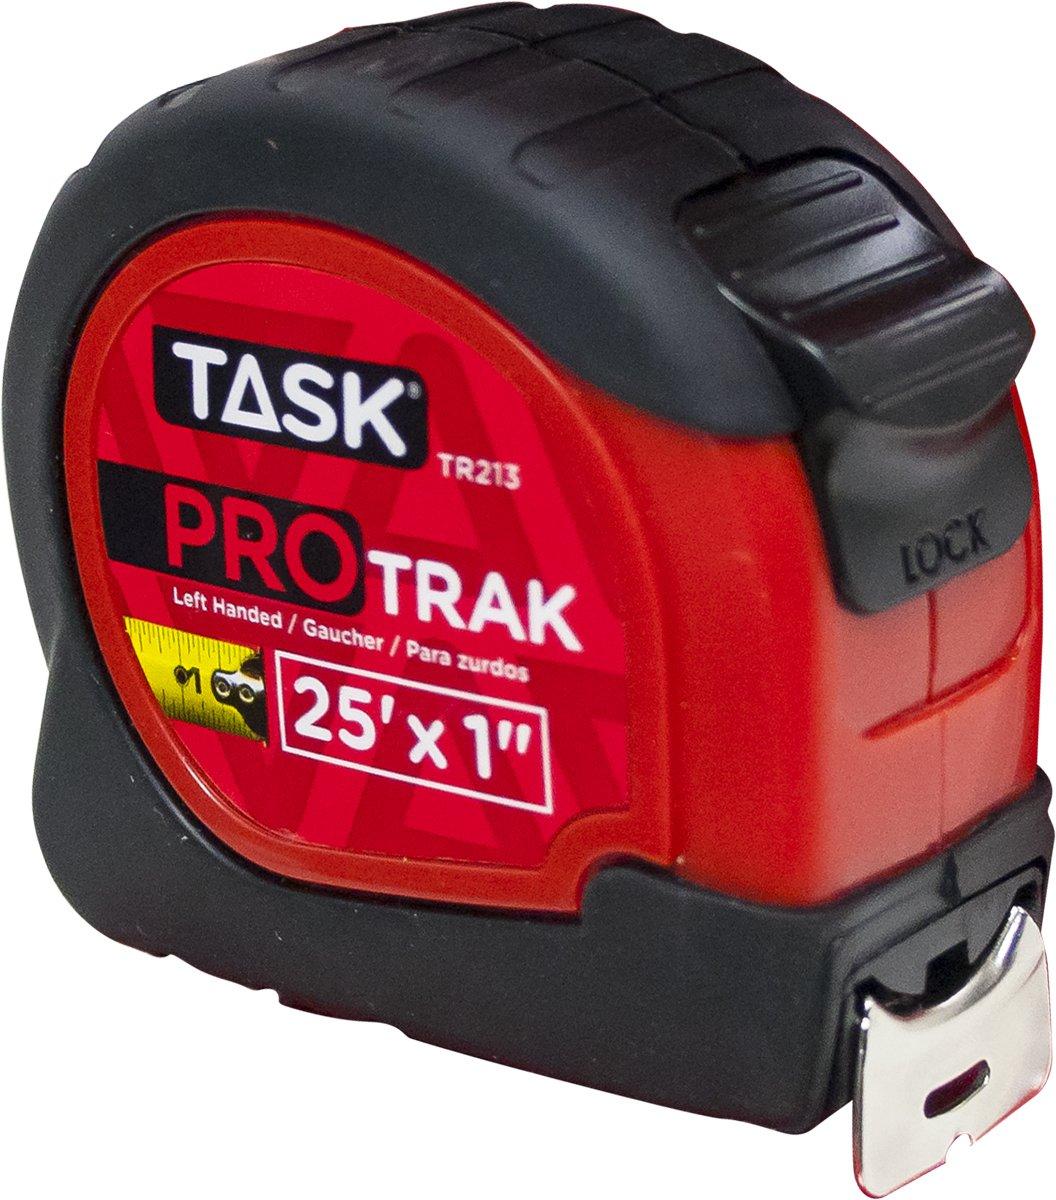 Task Tools TR213 25-Feet ProTrak Tape Measure, Left-Handed, Red